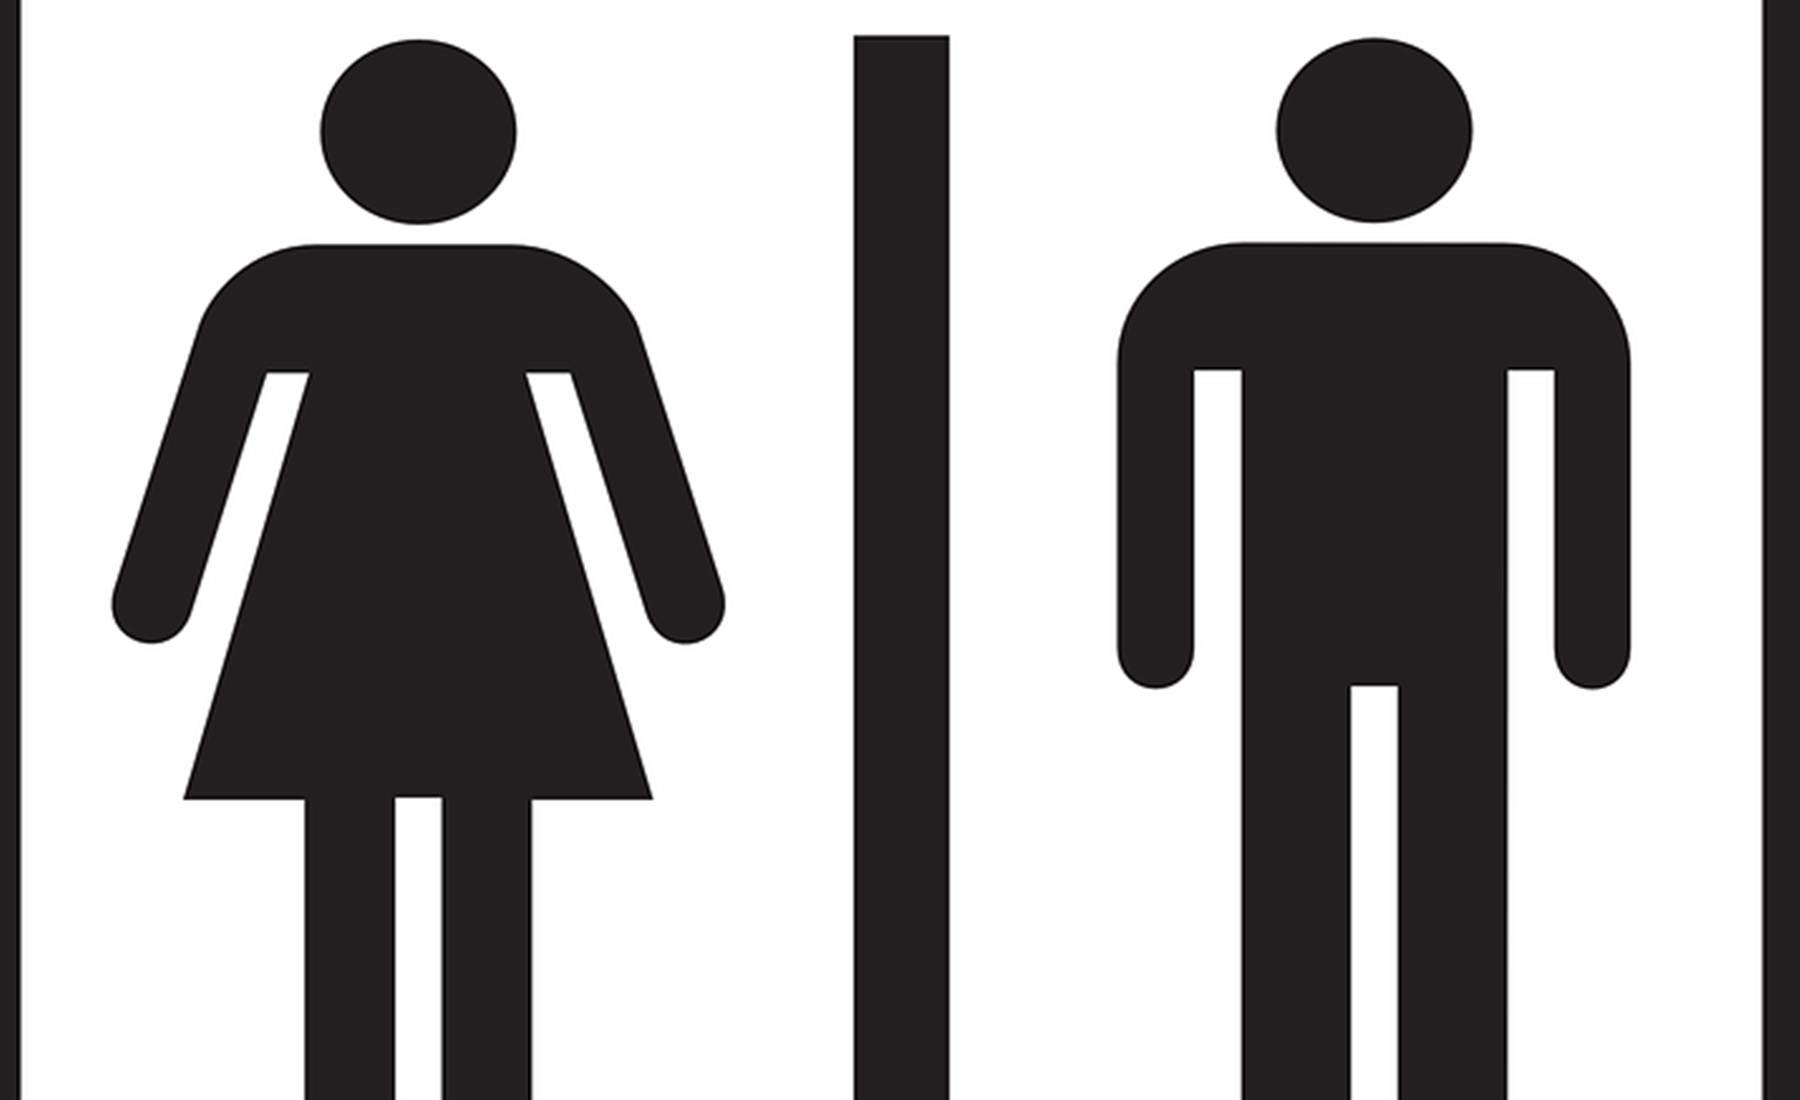 Cambios de sexo se disparan en Nueva York